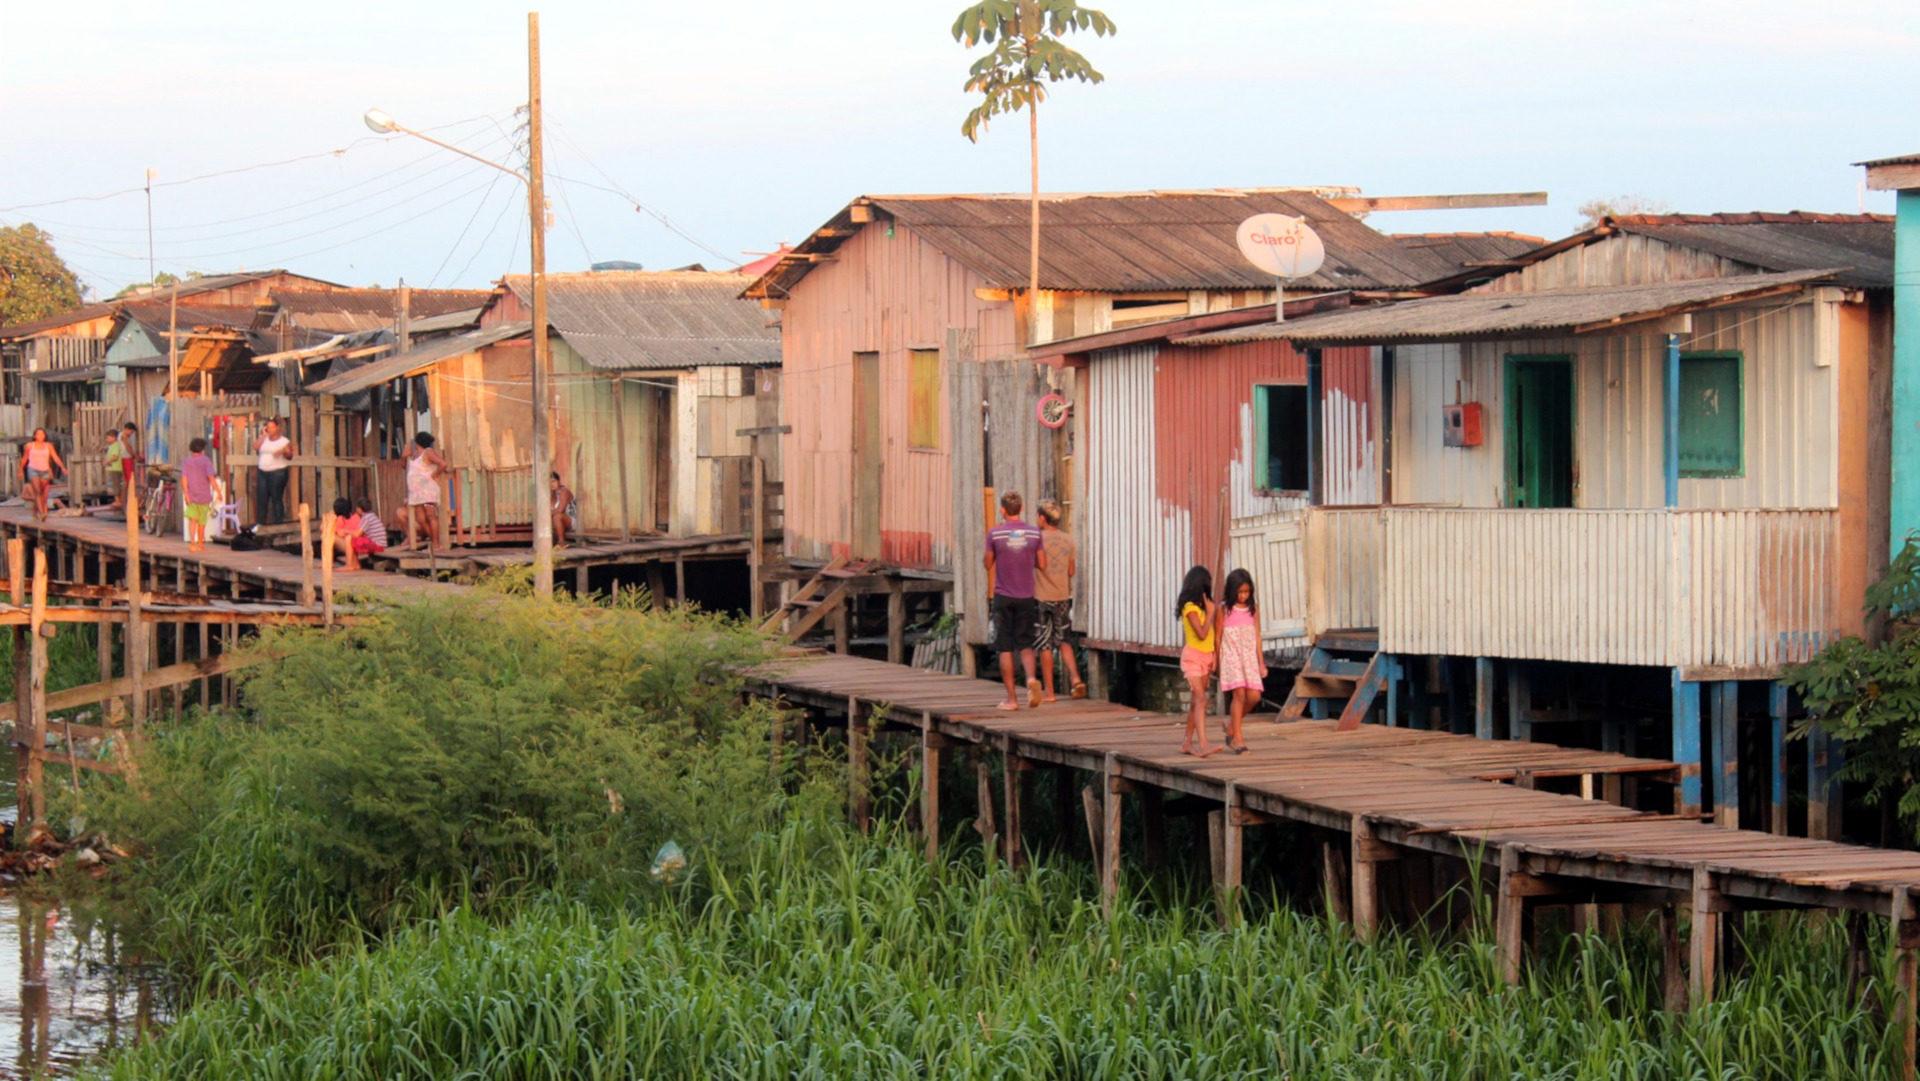 Armenviertel am Amazonas   ©pixabay/Anfri, Pixabay License